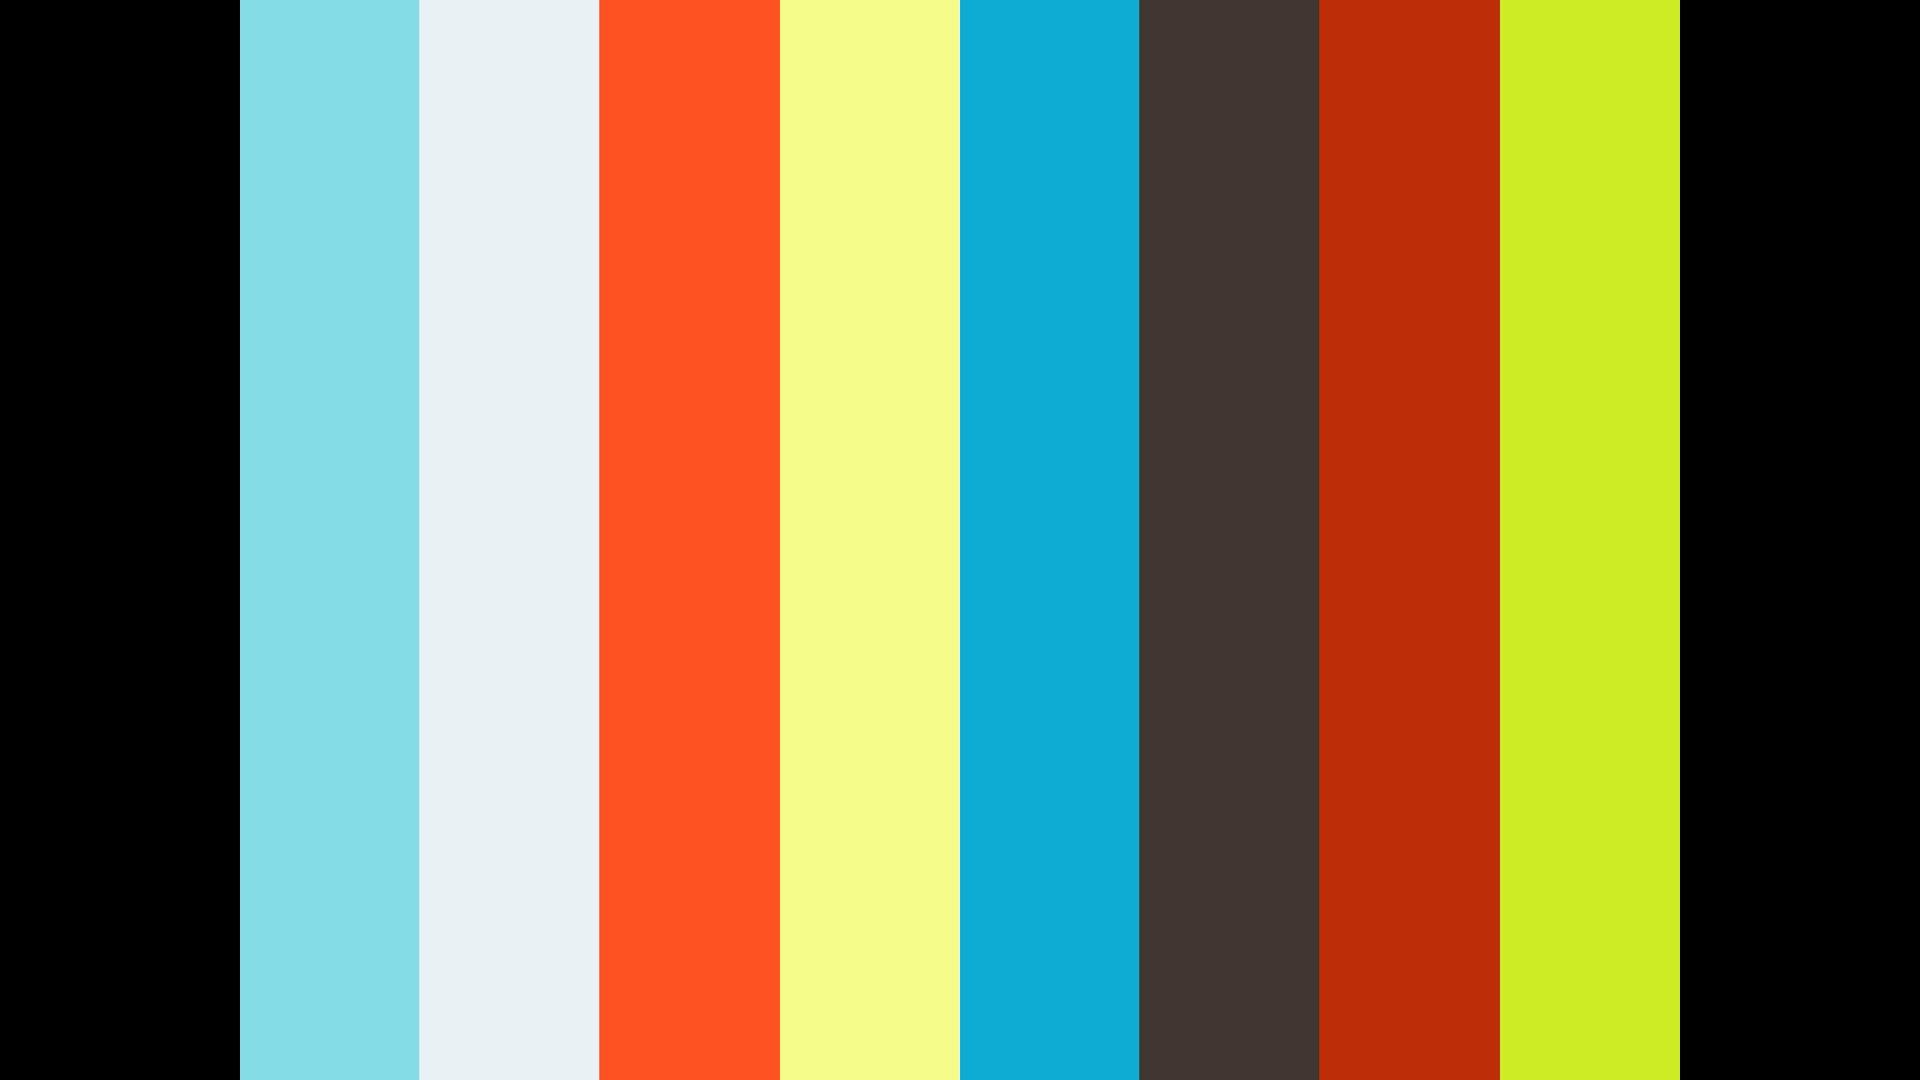 Benson Muite & Bernard Banta – Building an Online Store With Gitlab Pages